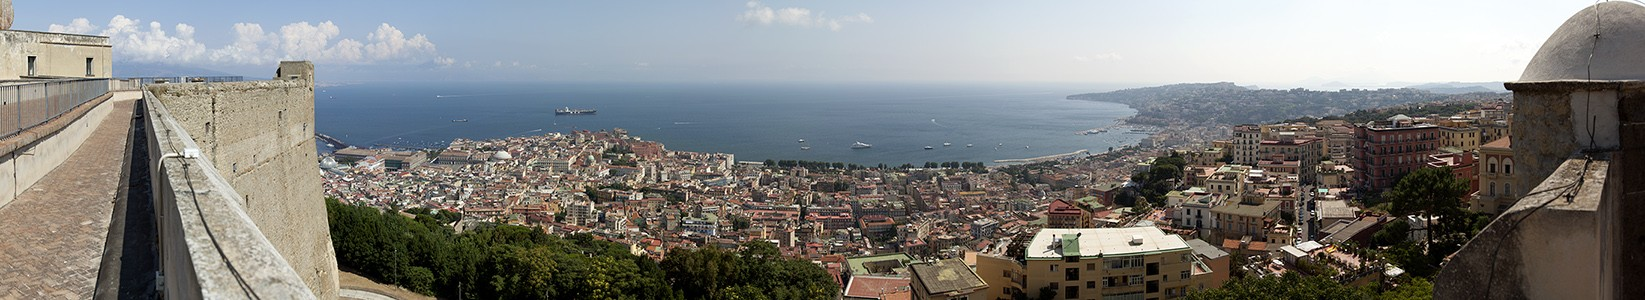 Blick vom Castel Sant' Elmo: Neapel, Golf von Neapel Neapel